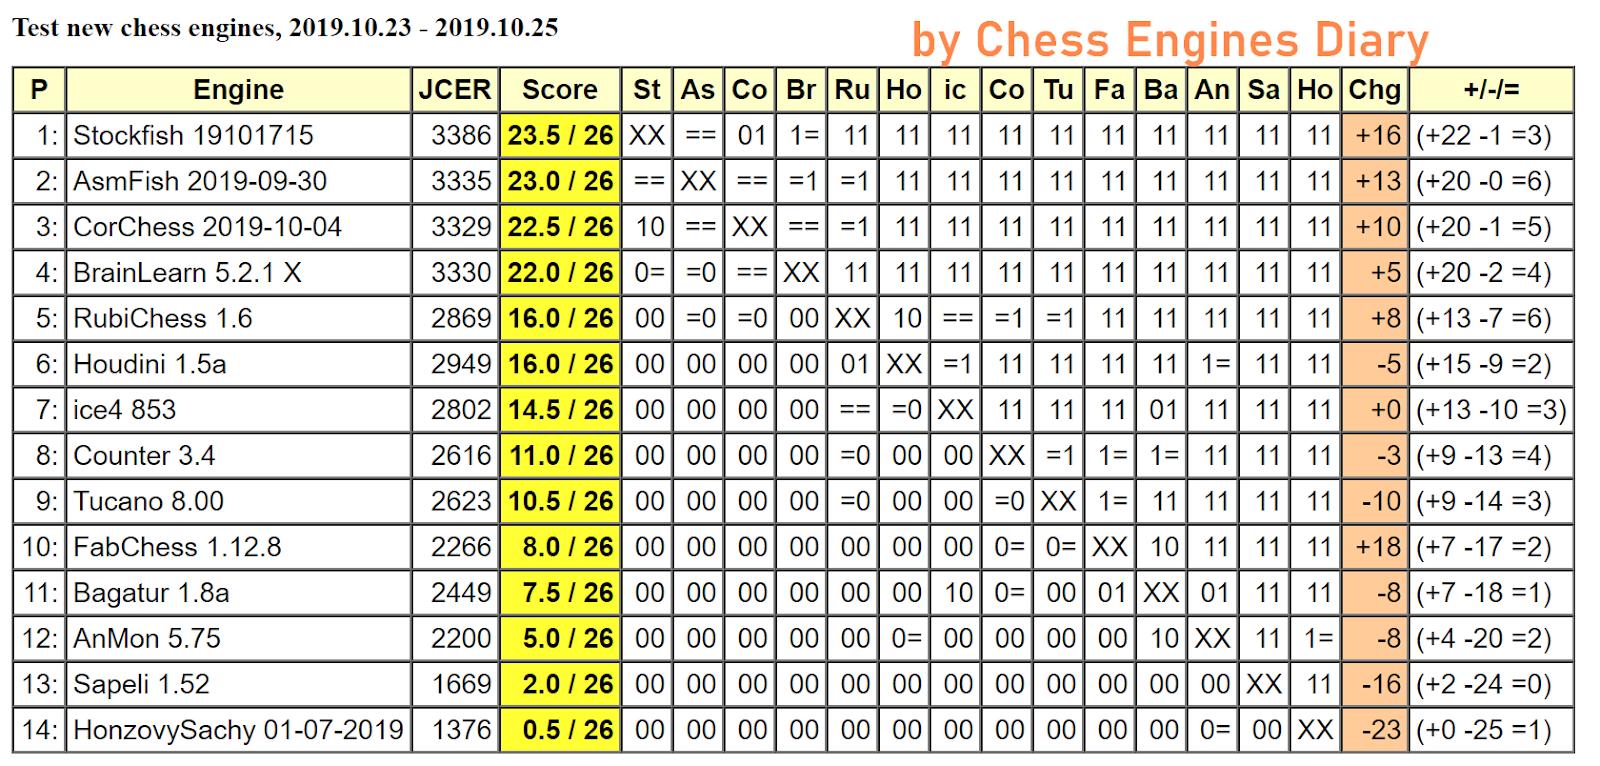 JCER (Jurek Chess Engines Rating) tournaments - Page 19 2019.10.23.TestnewchessenginesScid.html